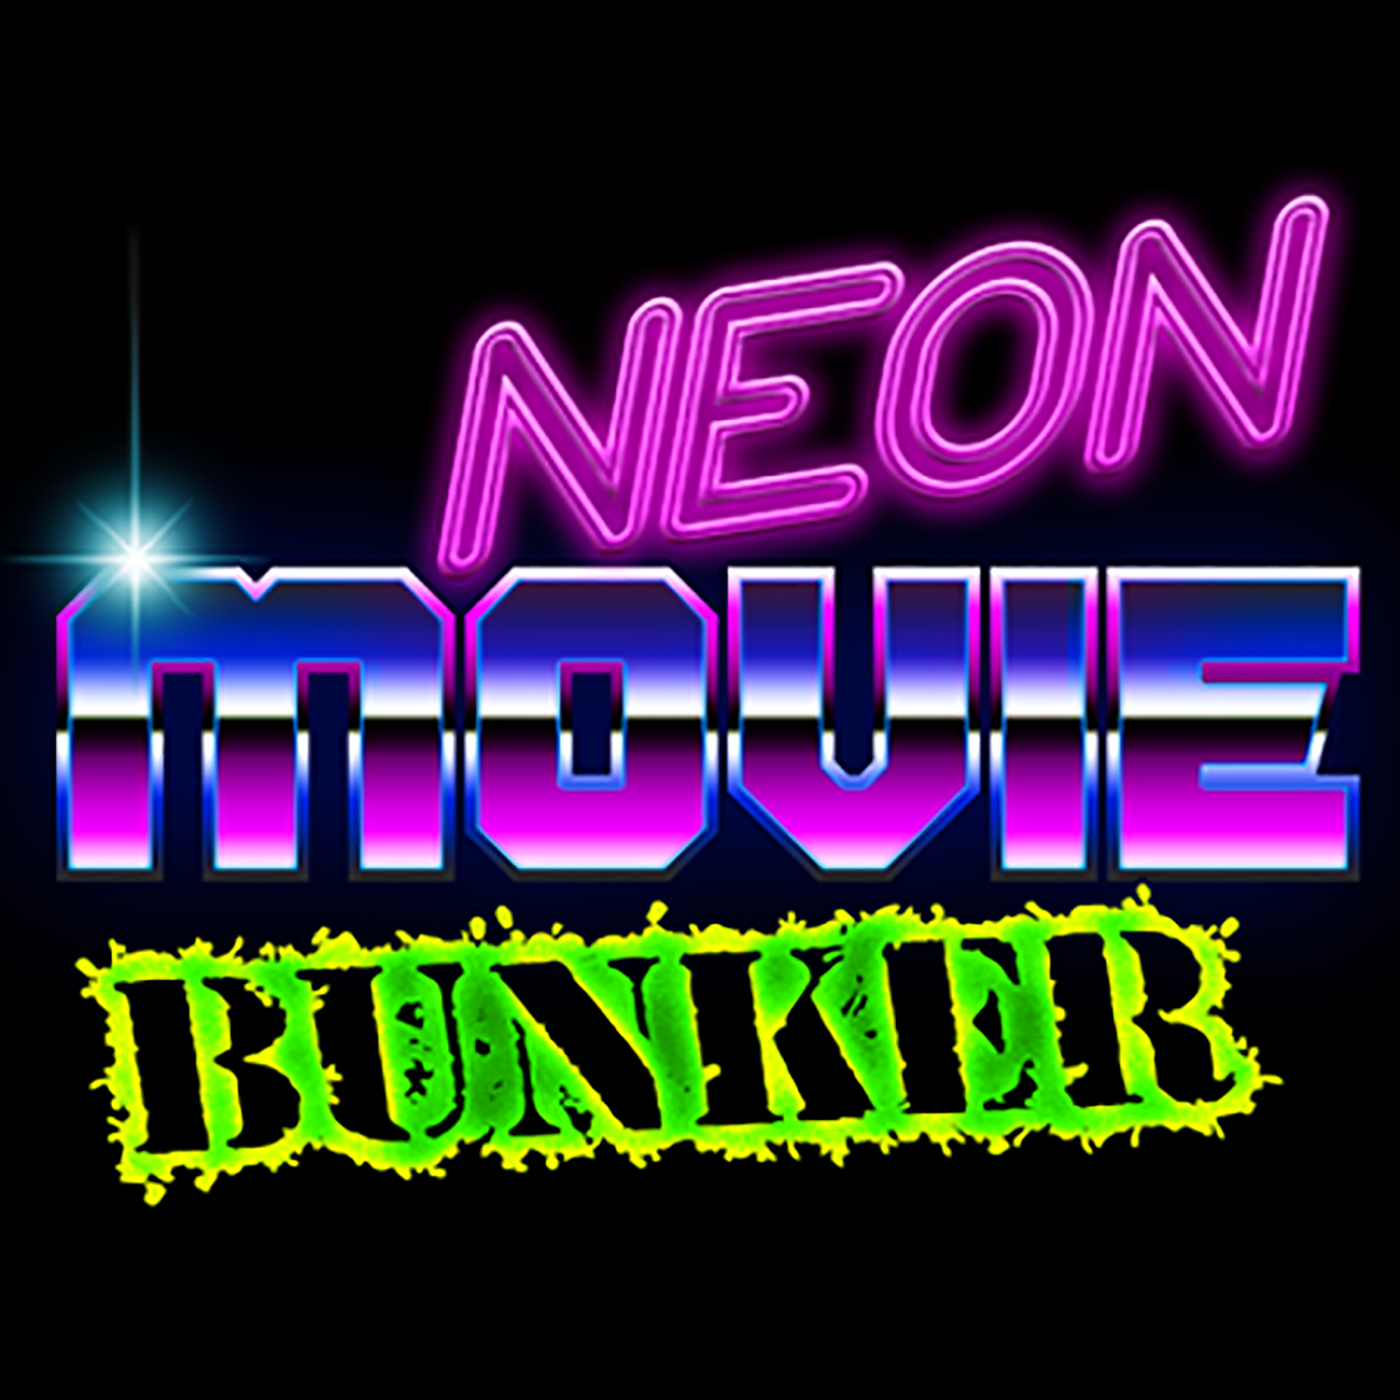 The Neon Movie Bunker show art